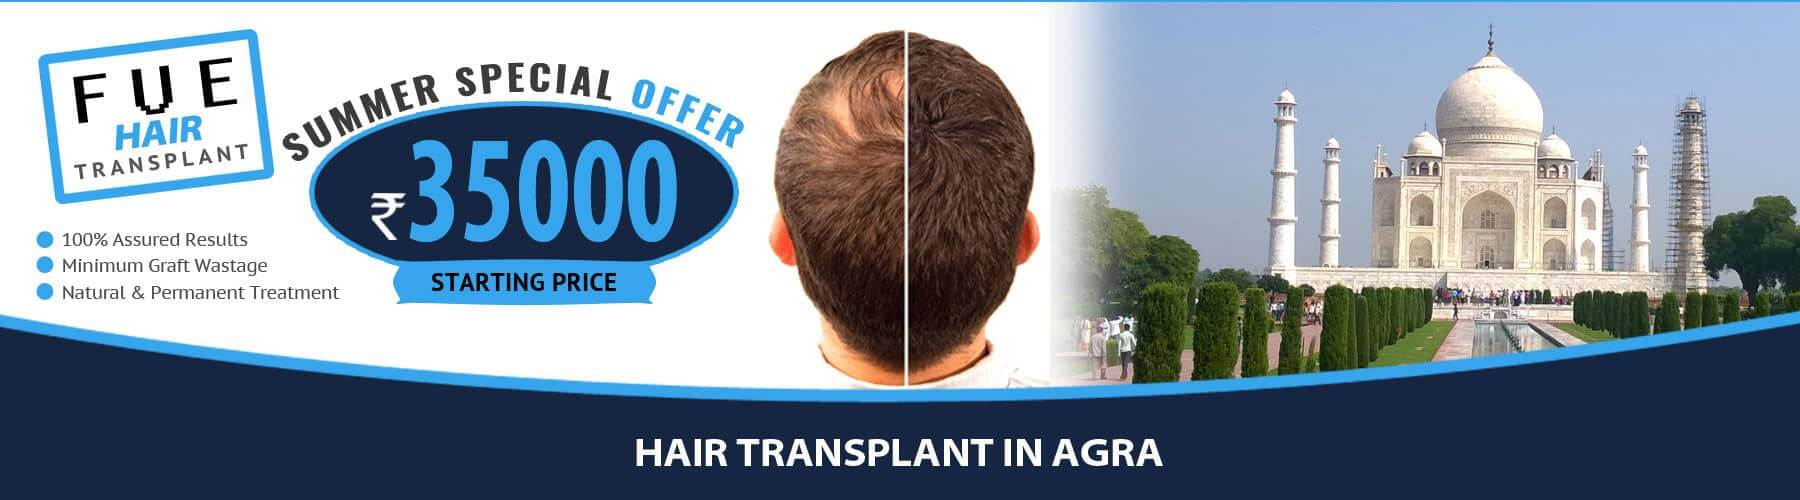 Hair Transplant Agra